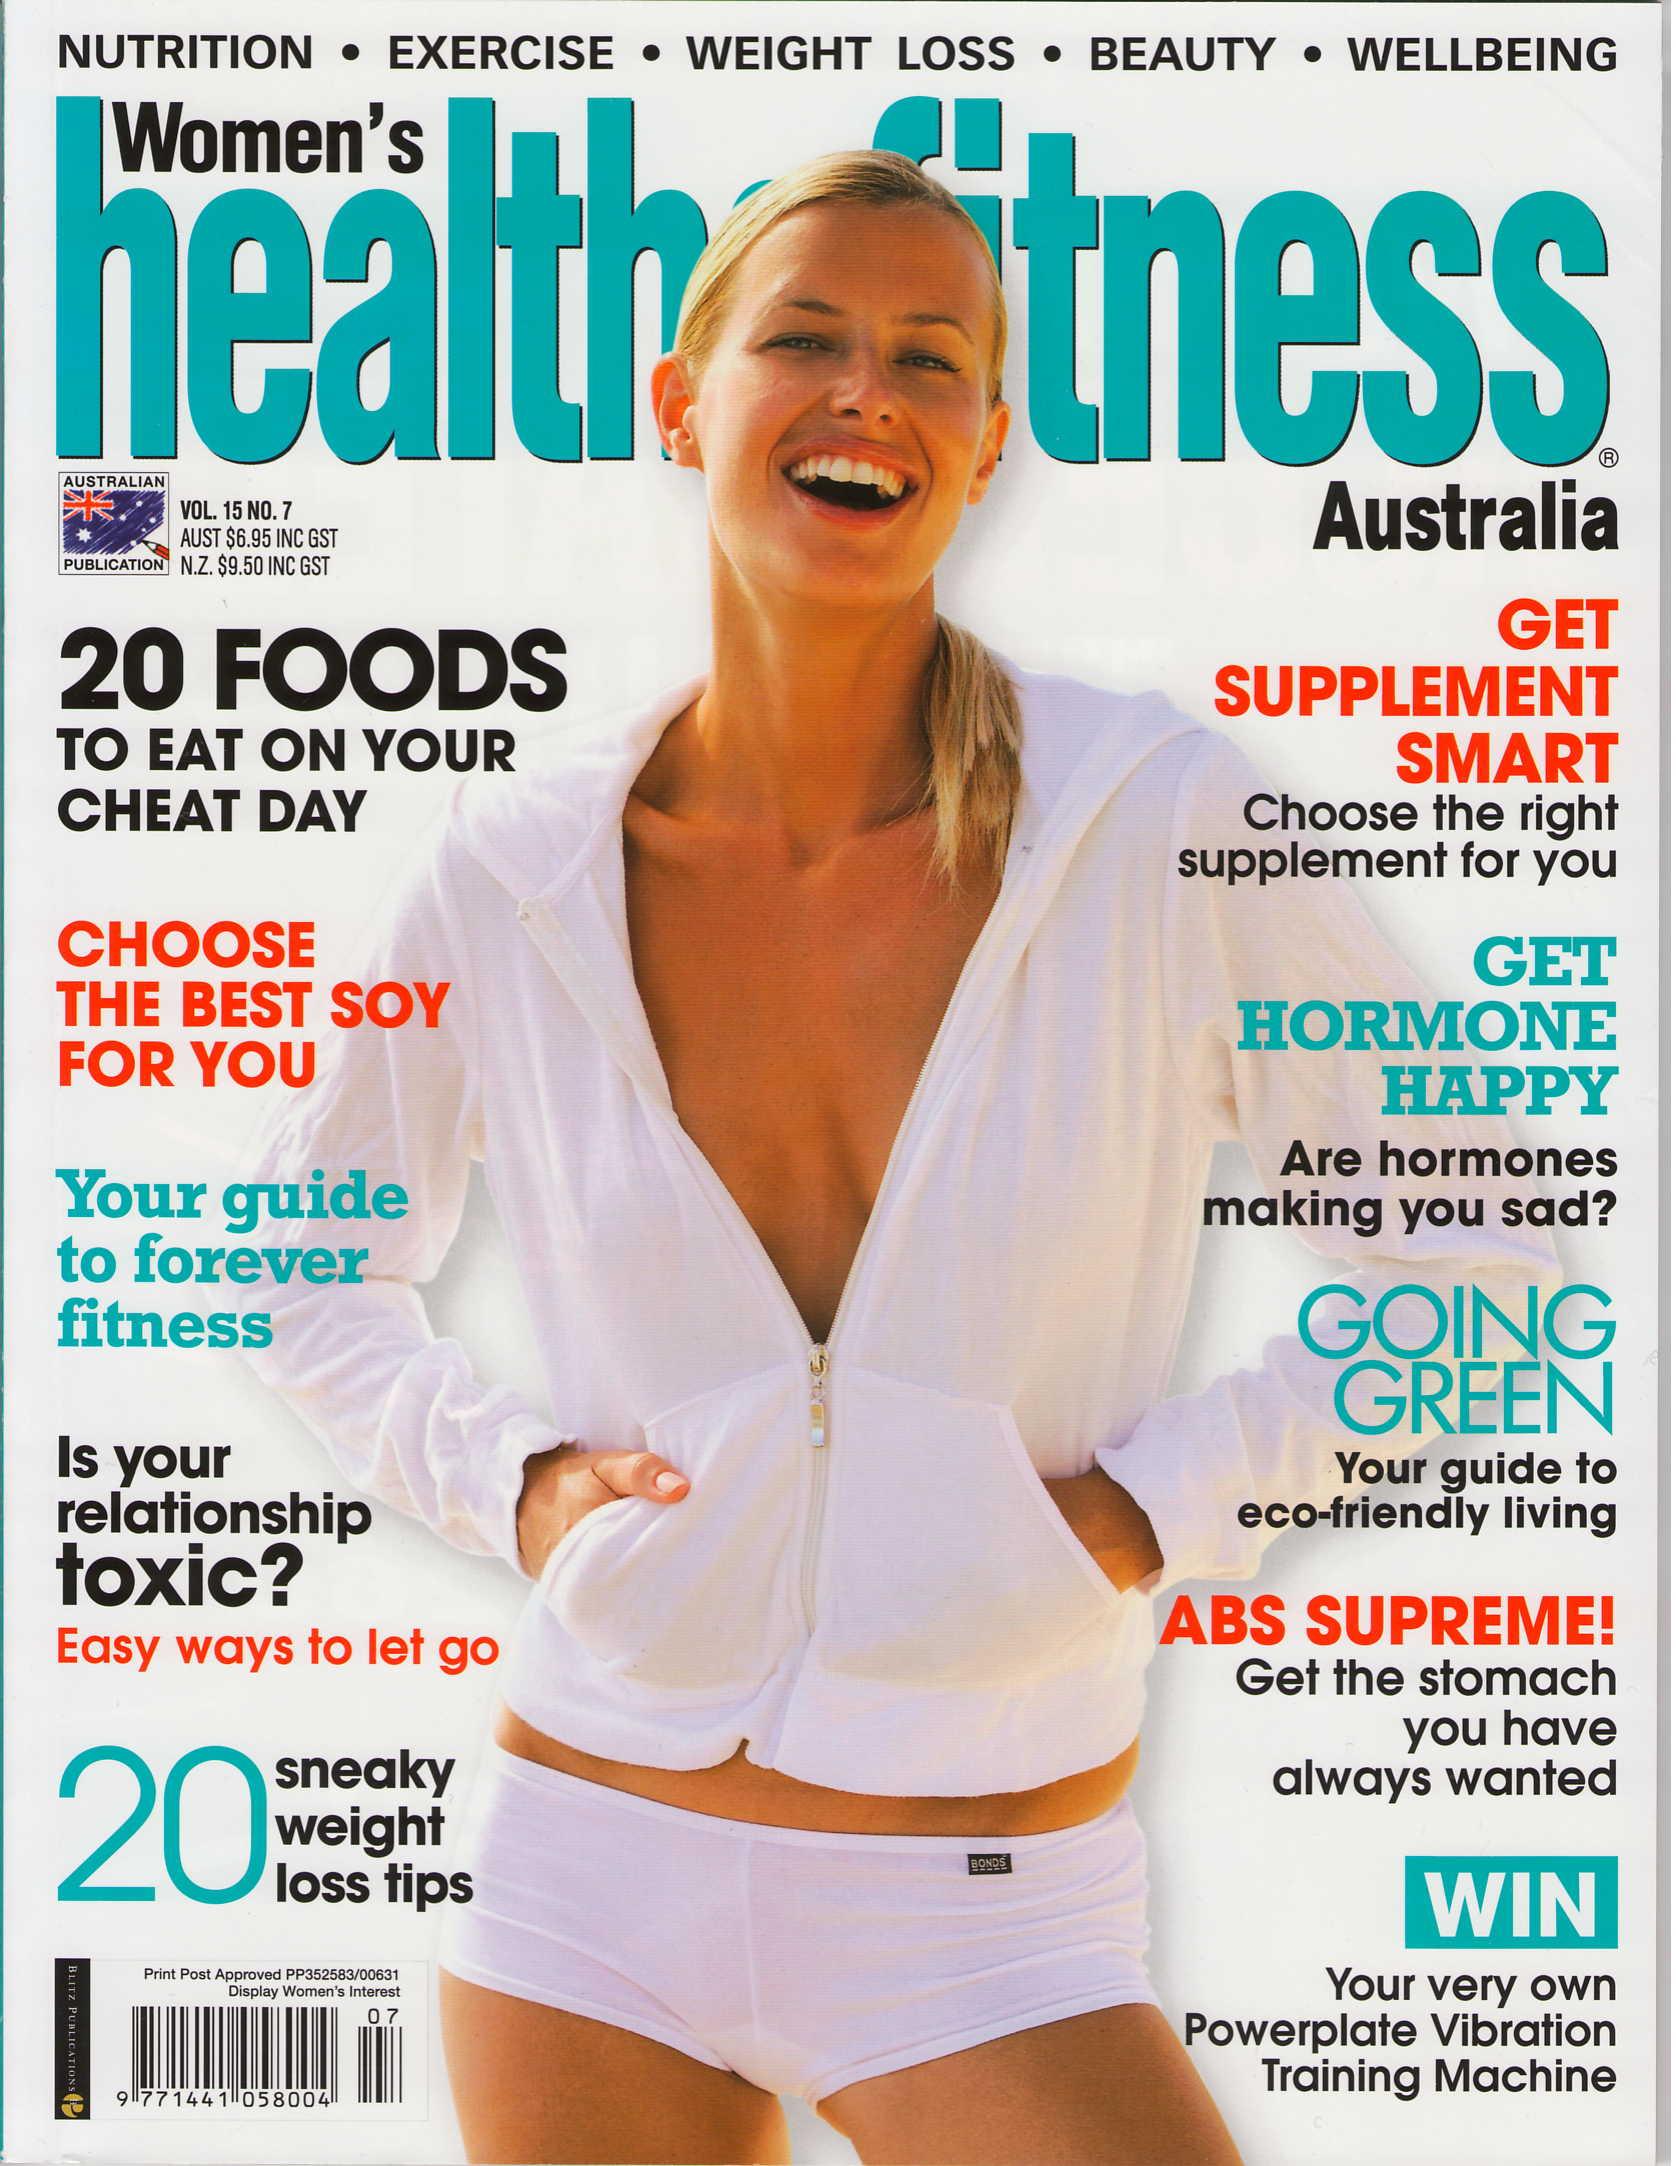 Get supplement smart - cover